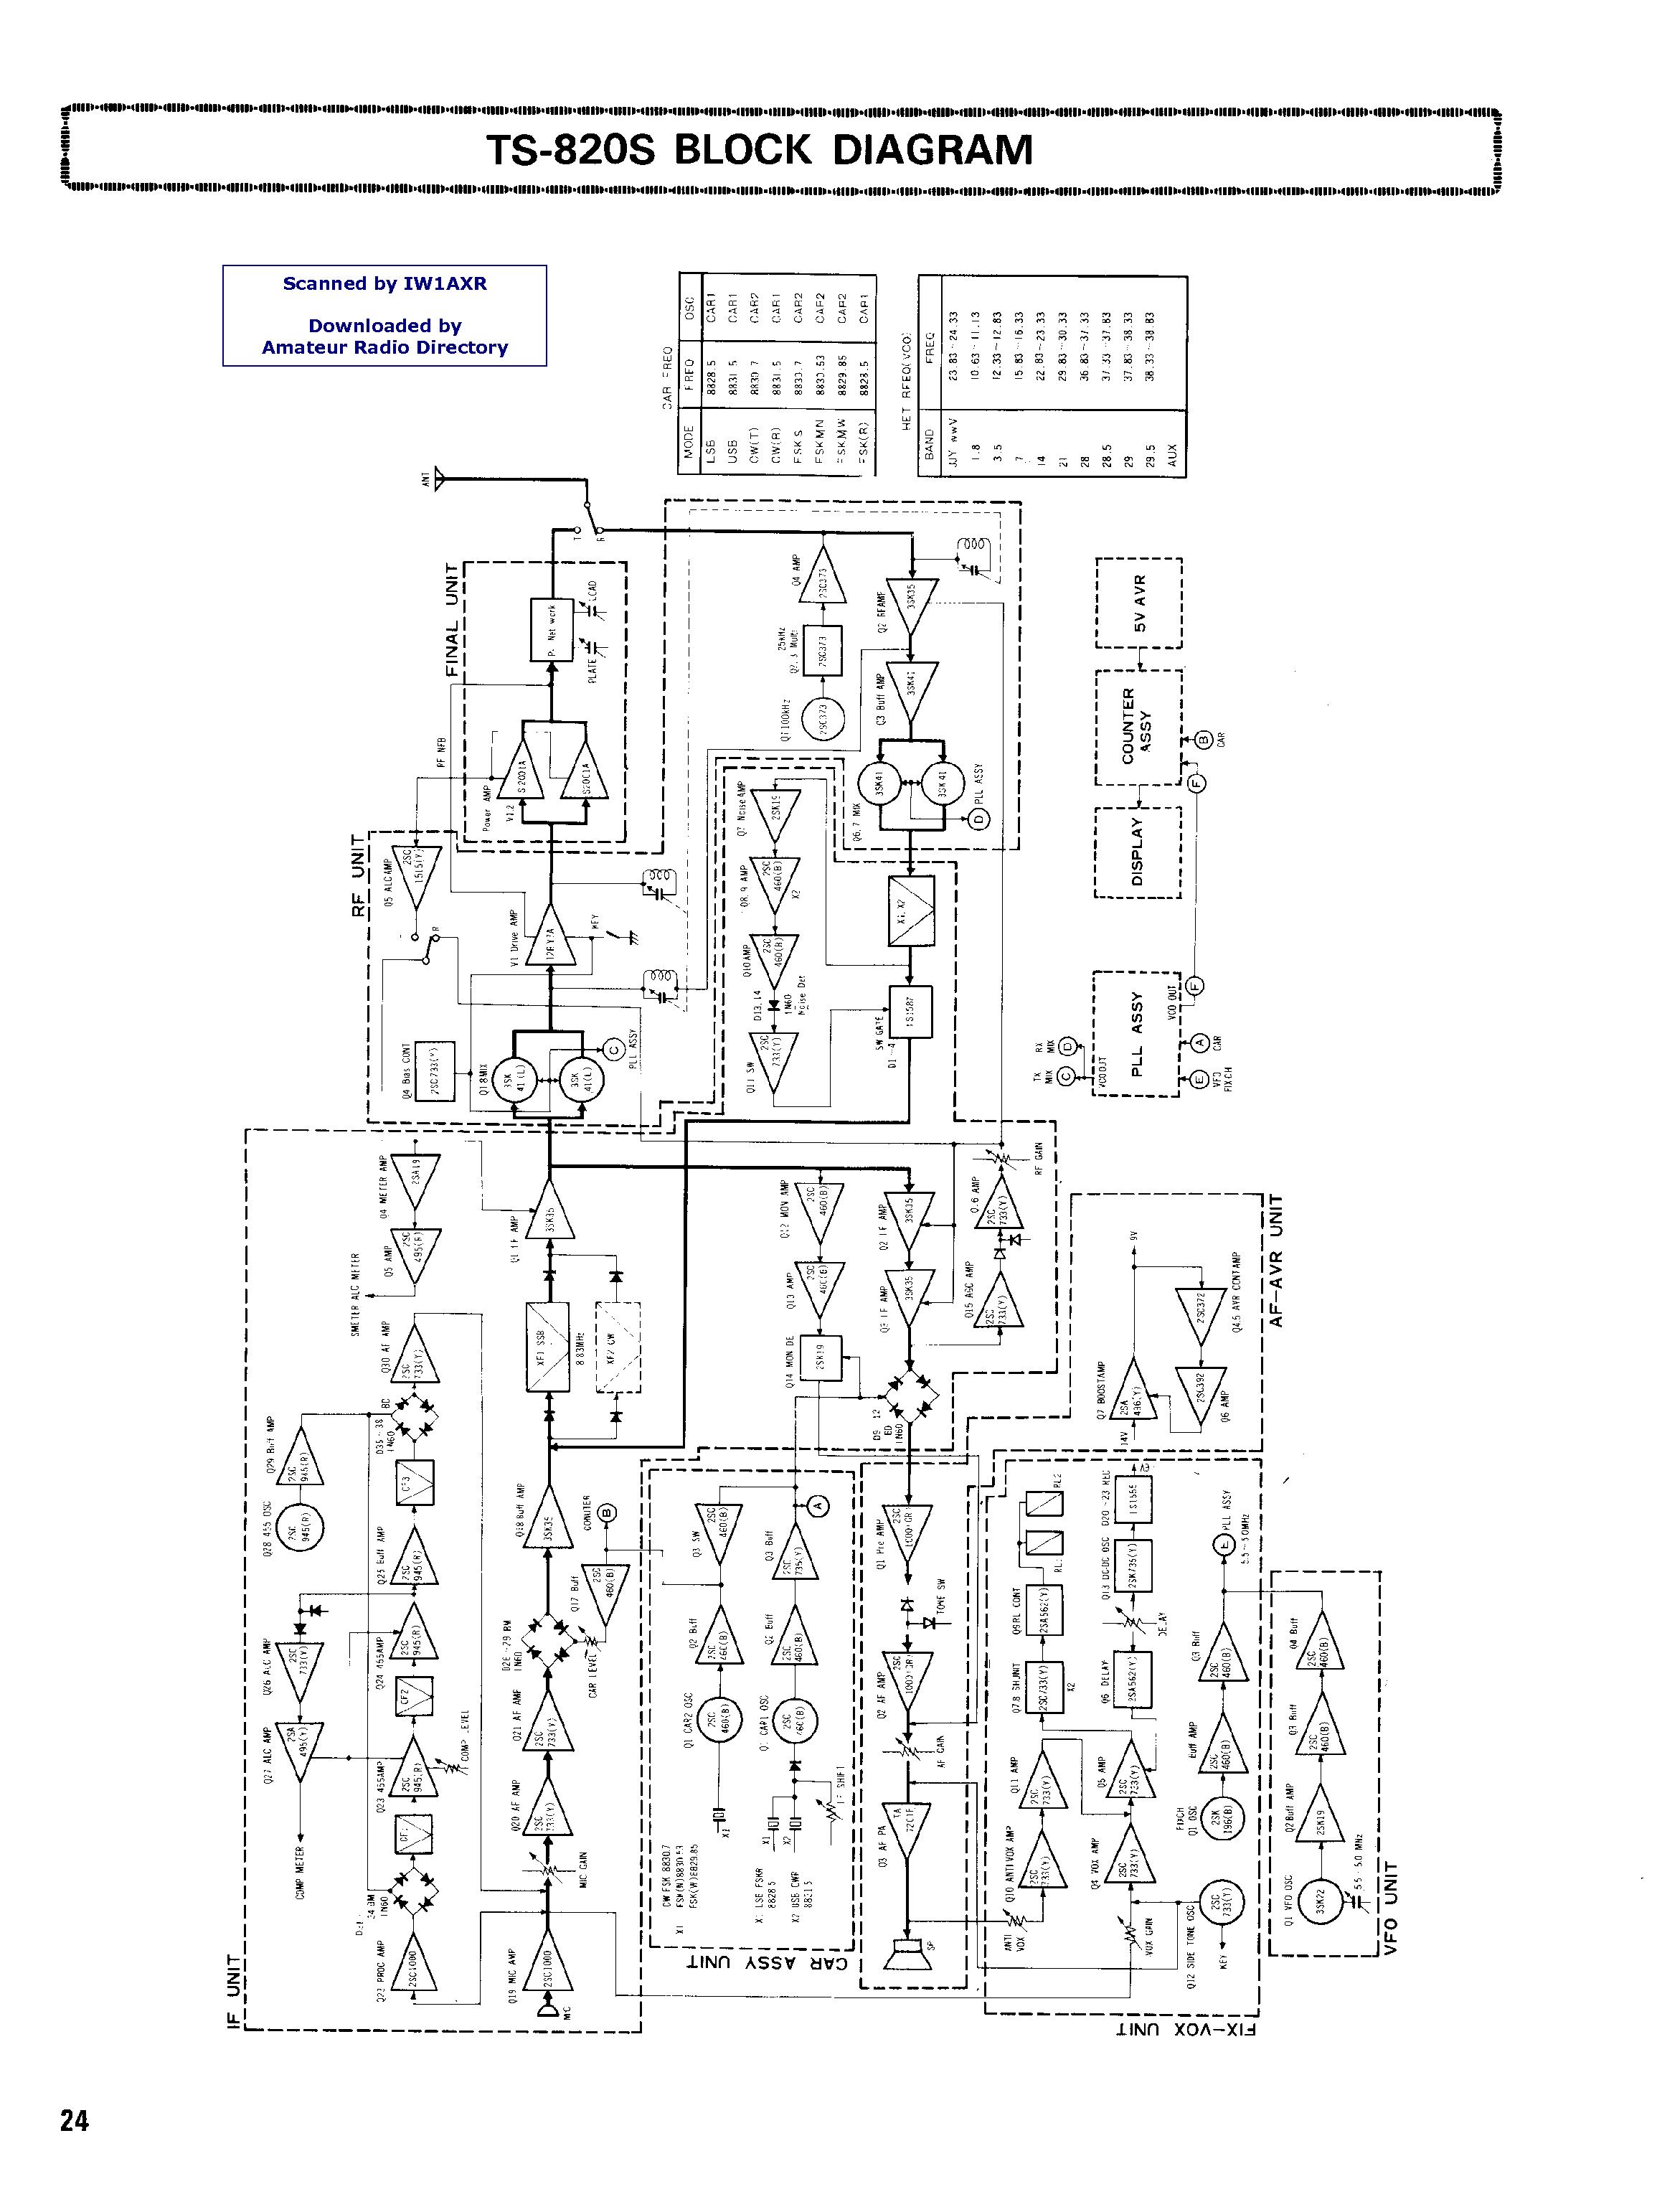 KENWOOD TS820 service manual (1st page)